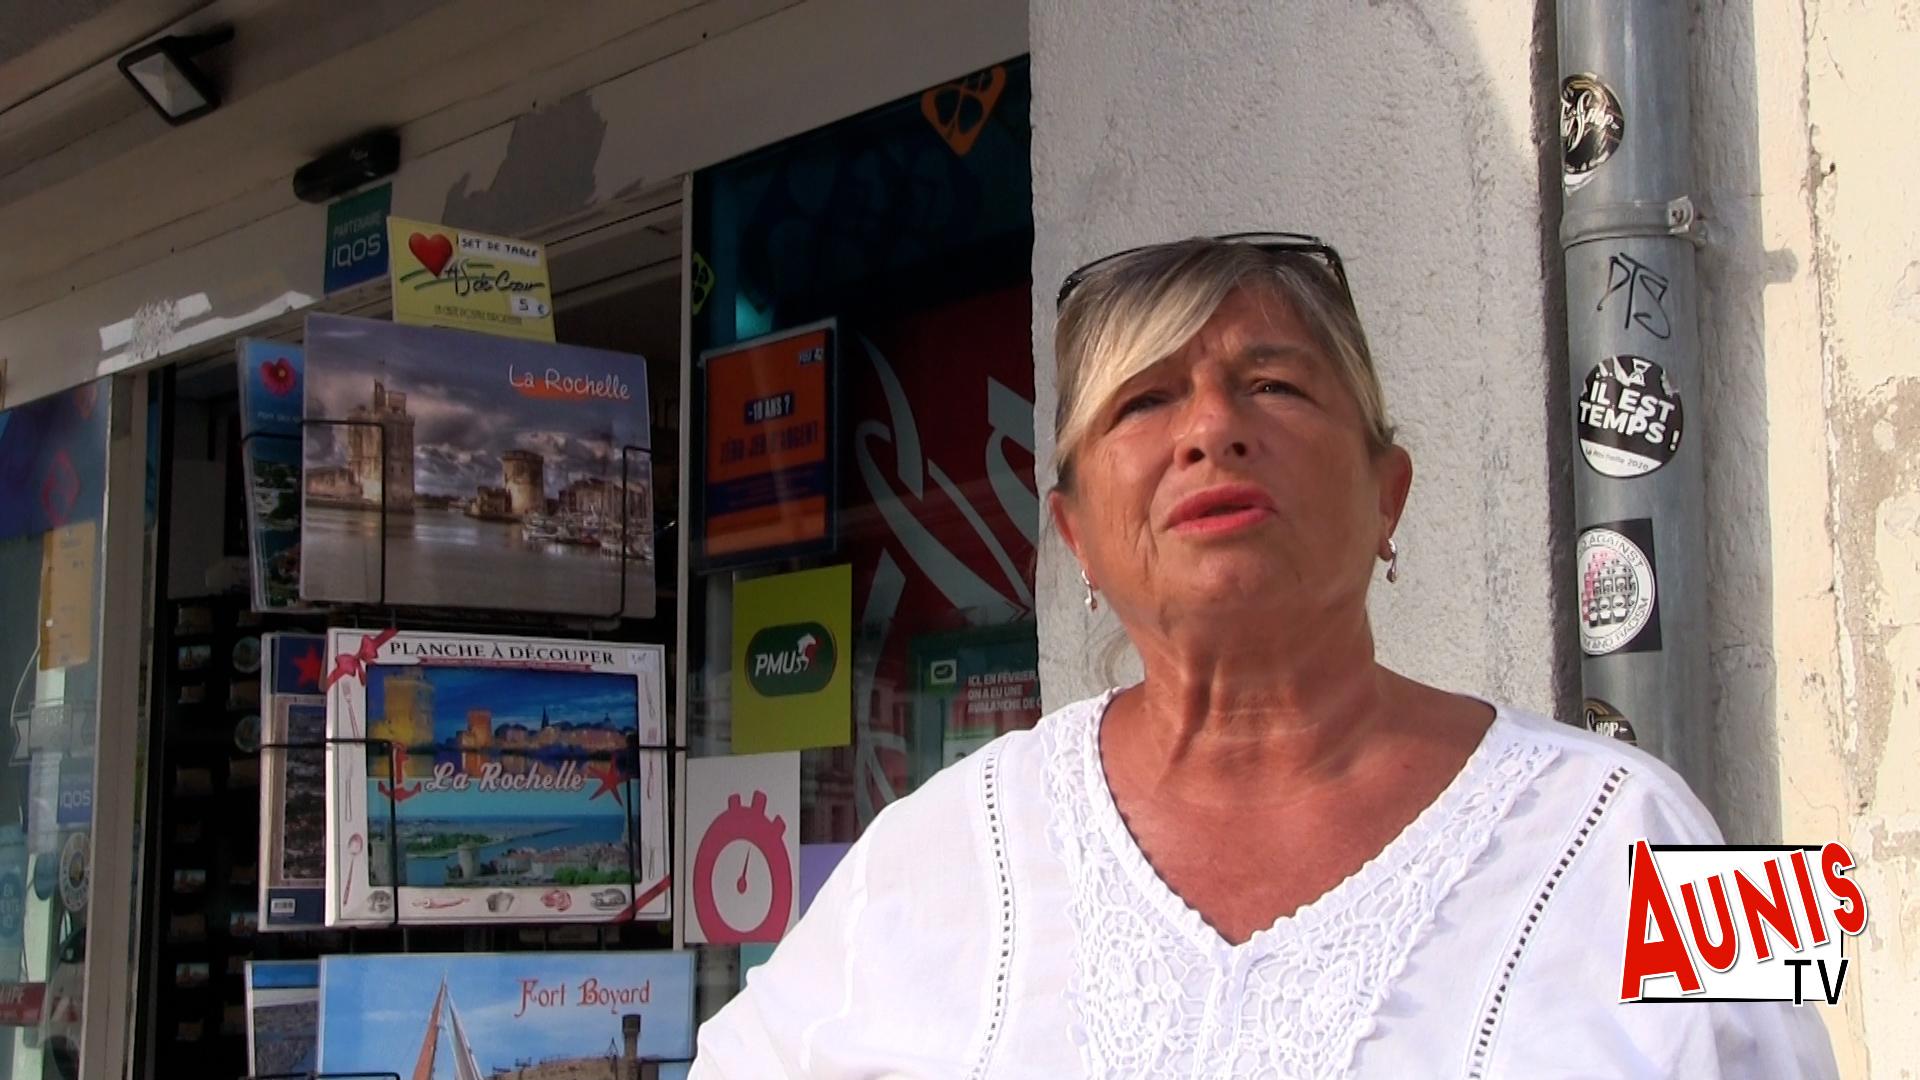 Tabac du port Rubrique à dada Martine Lescalmel